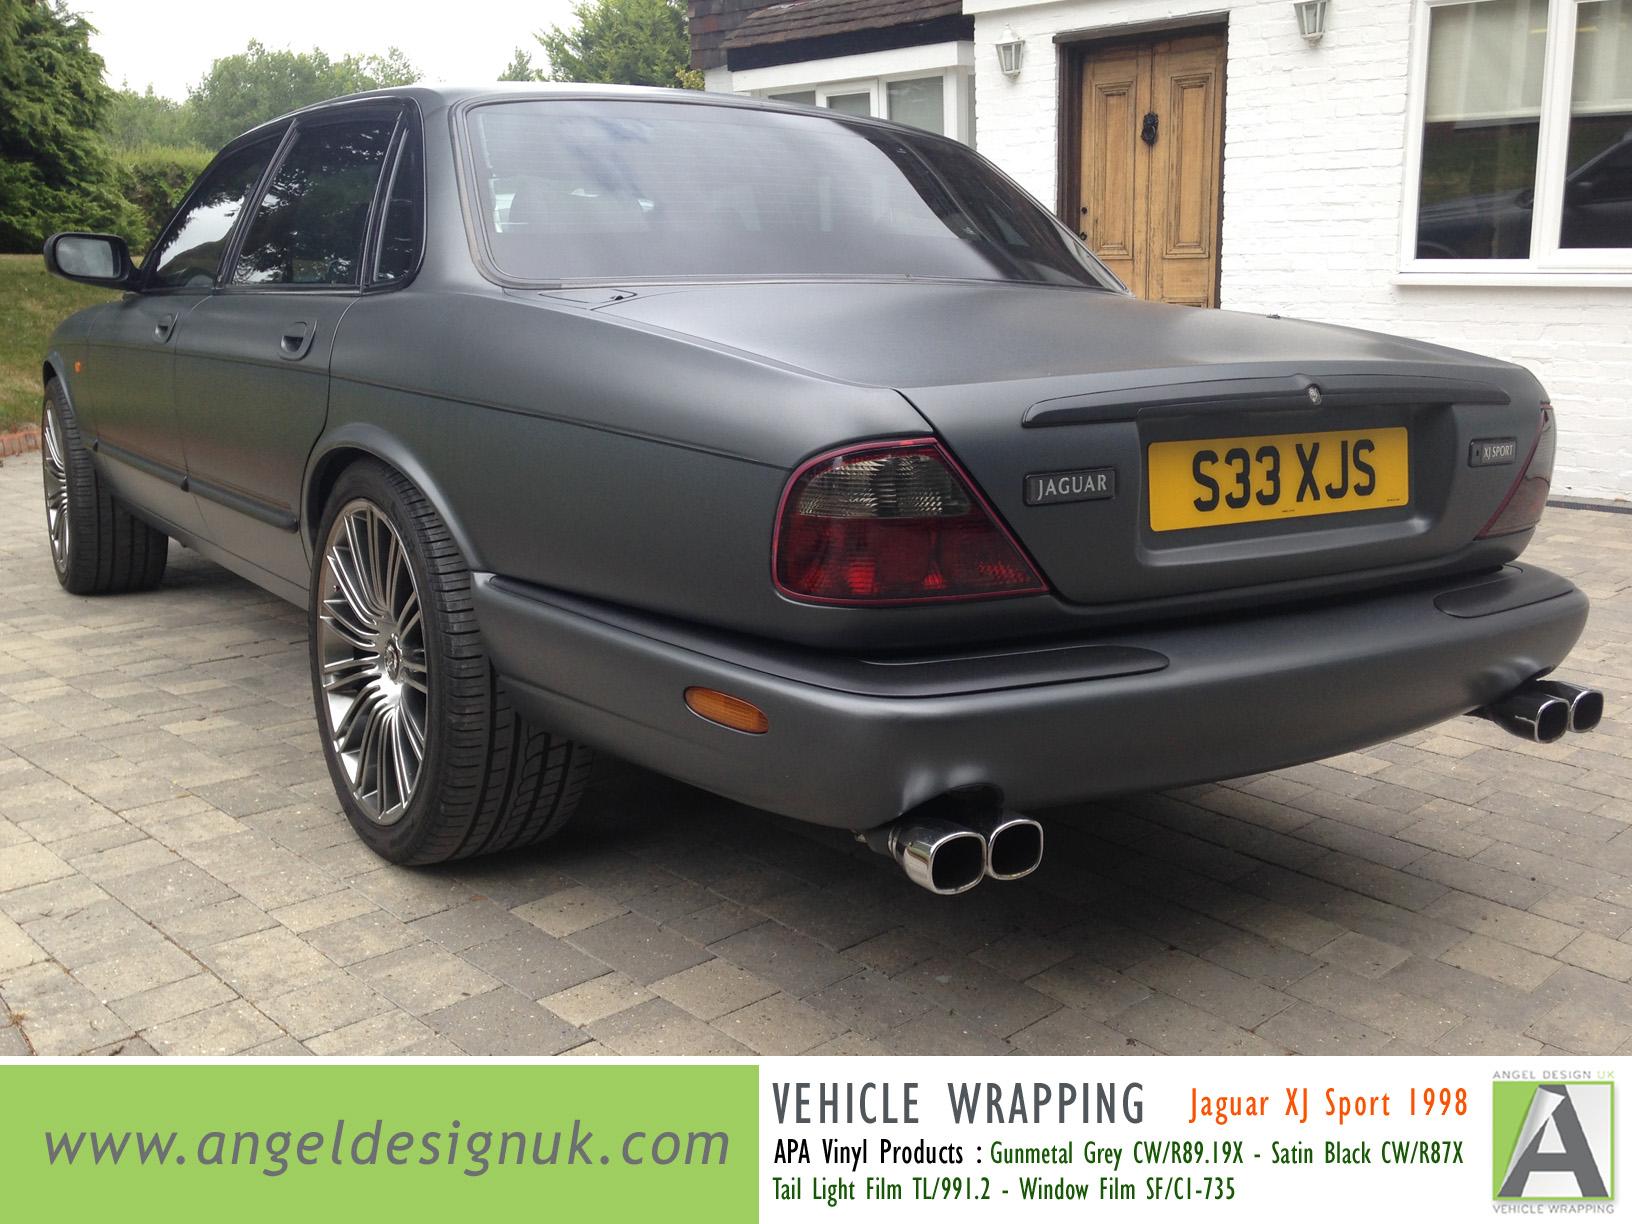 ANGEL DESIGN UK Vehicle Wrapping Jaguar XJ Sport 1998 Gunmetal Grey Pic 6